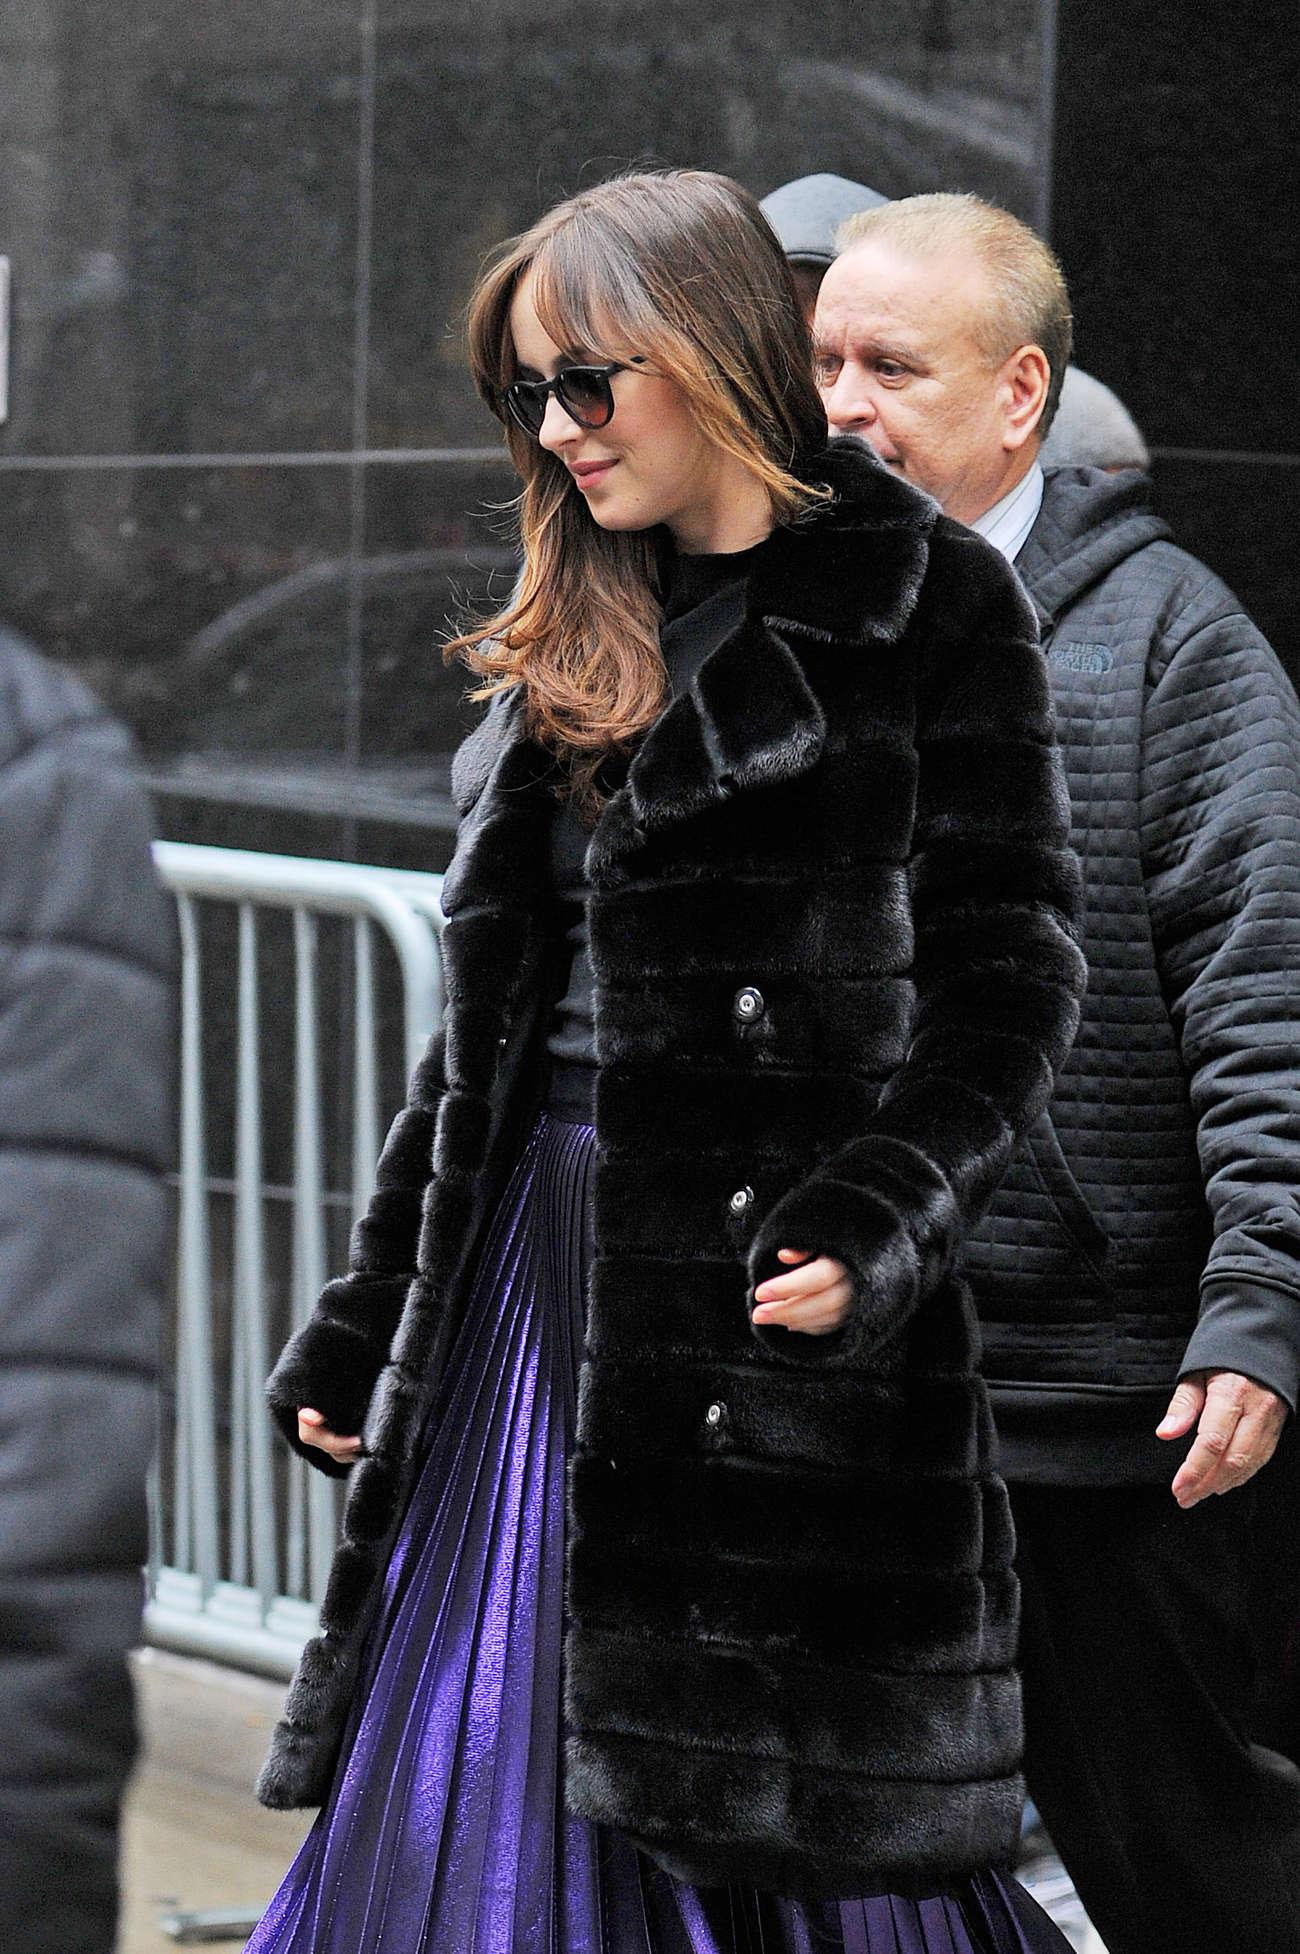 Dakota Johnson - Leaving ABC Studios after Good Morning America in NY